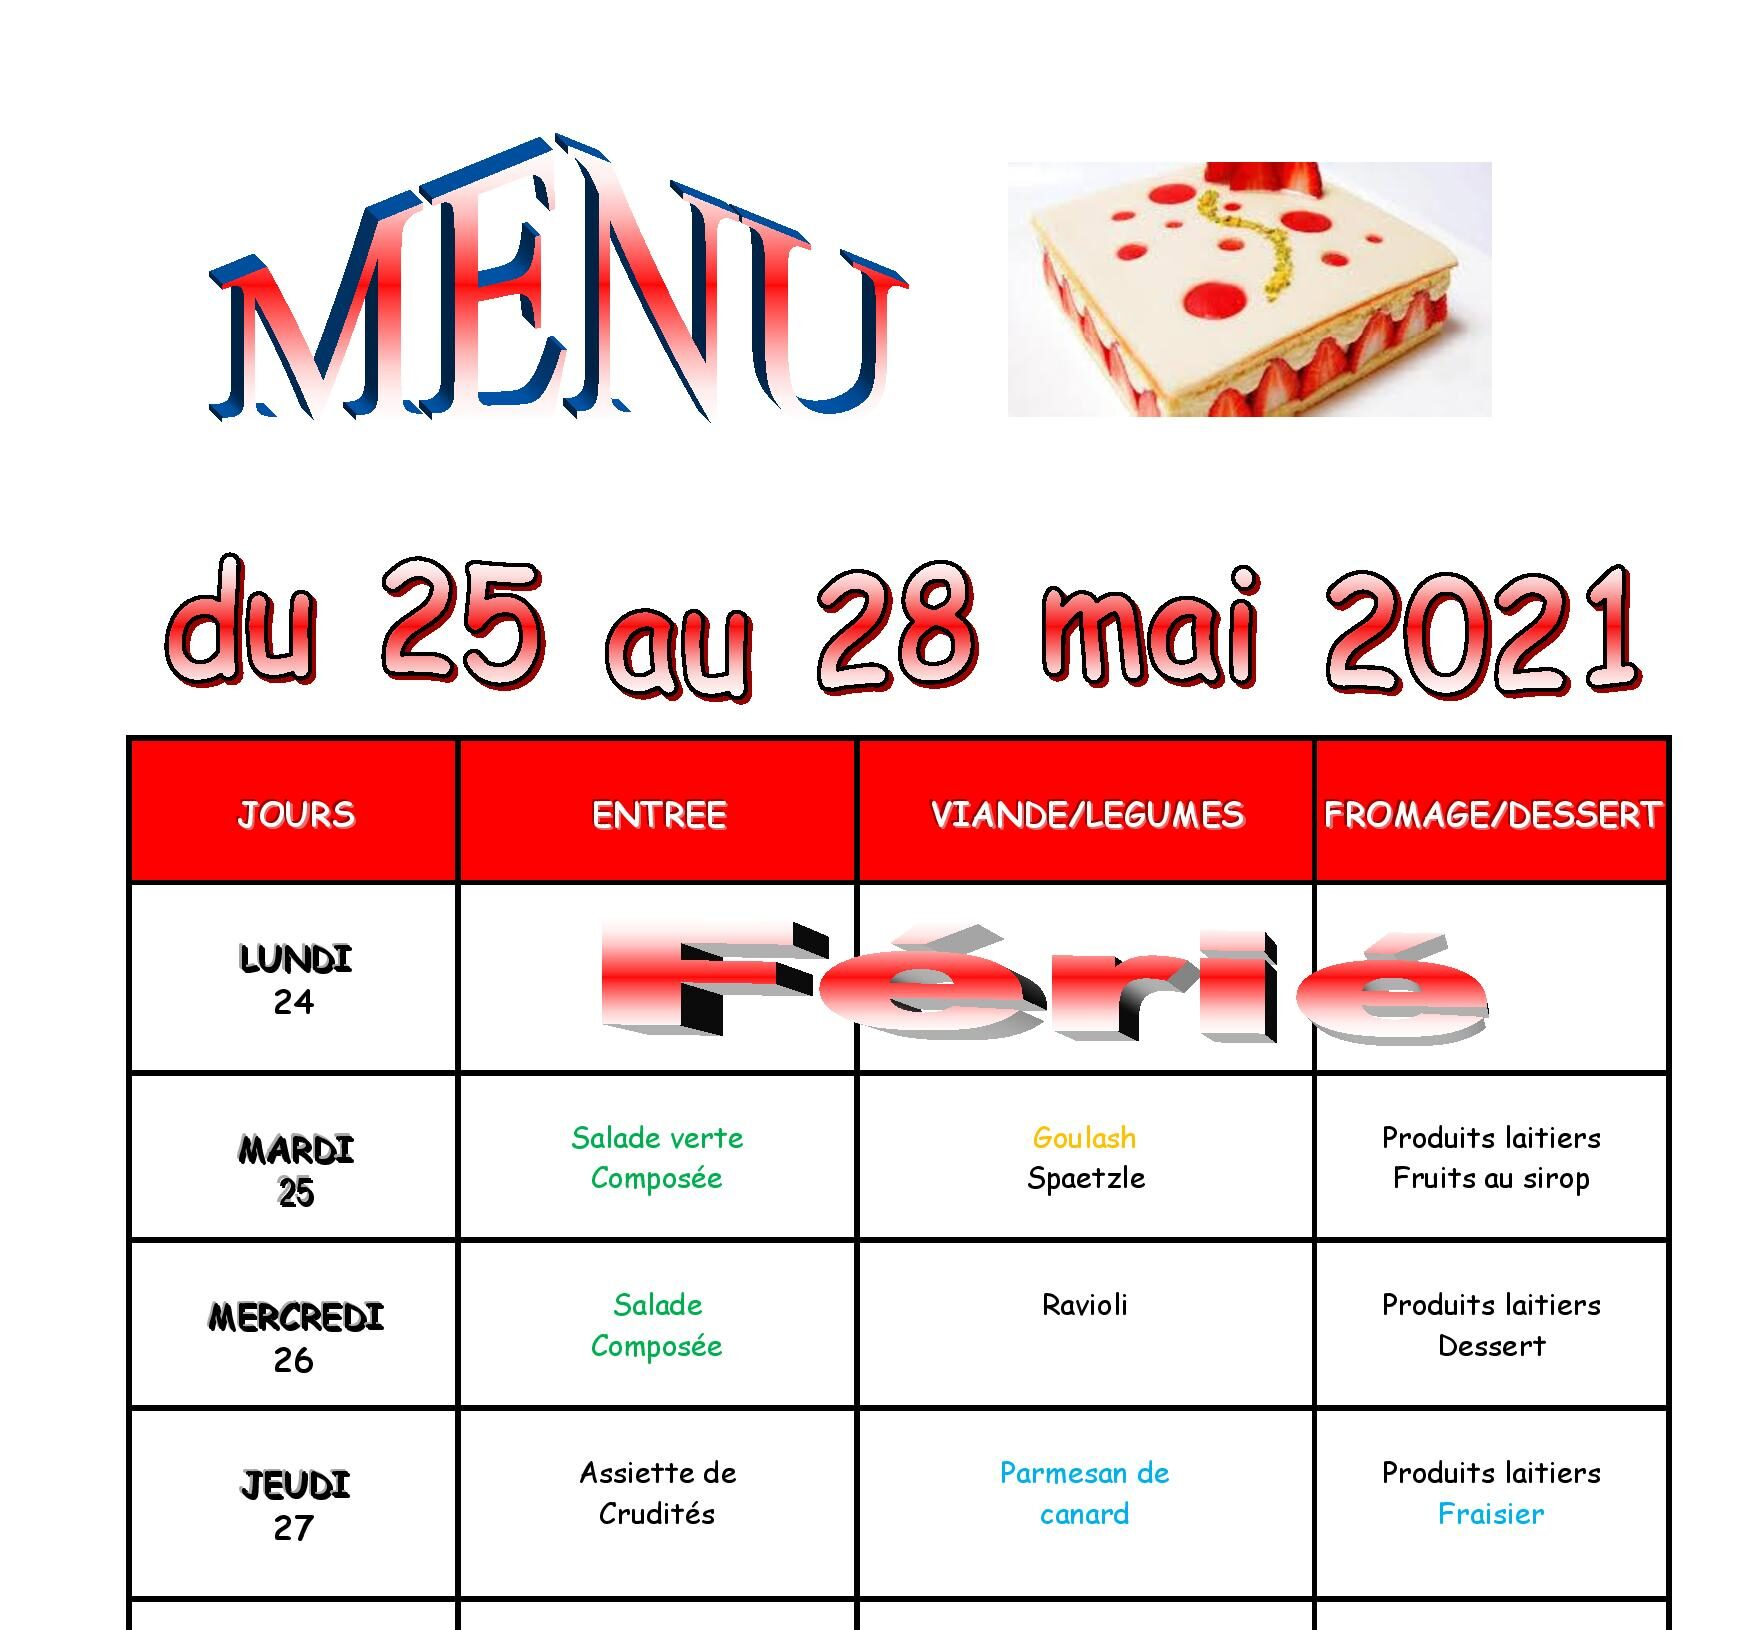 menu du 25 au 28 mai 2021-page-001.jpg